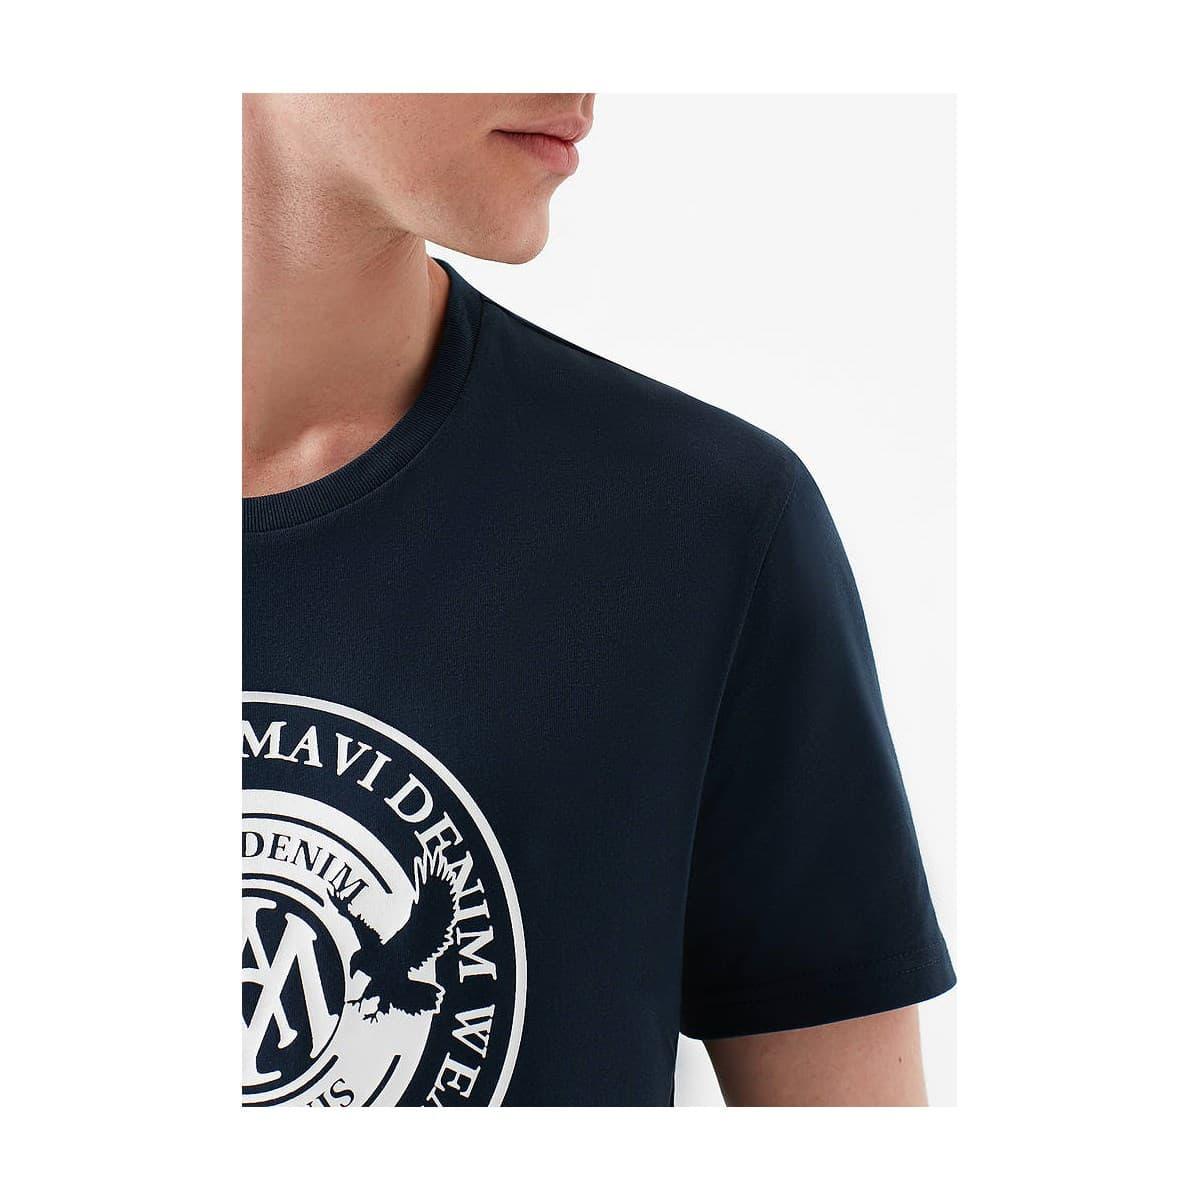 Mavi Baskili Tişört